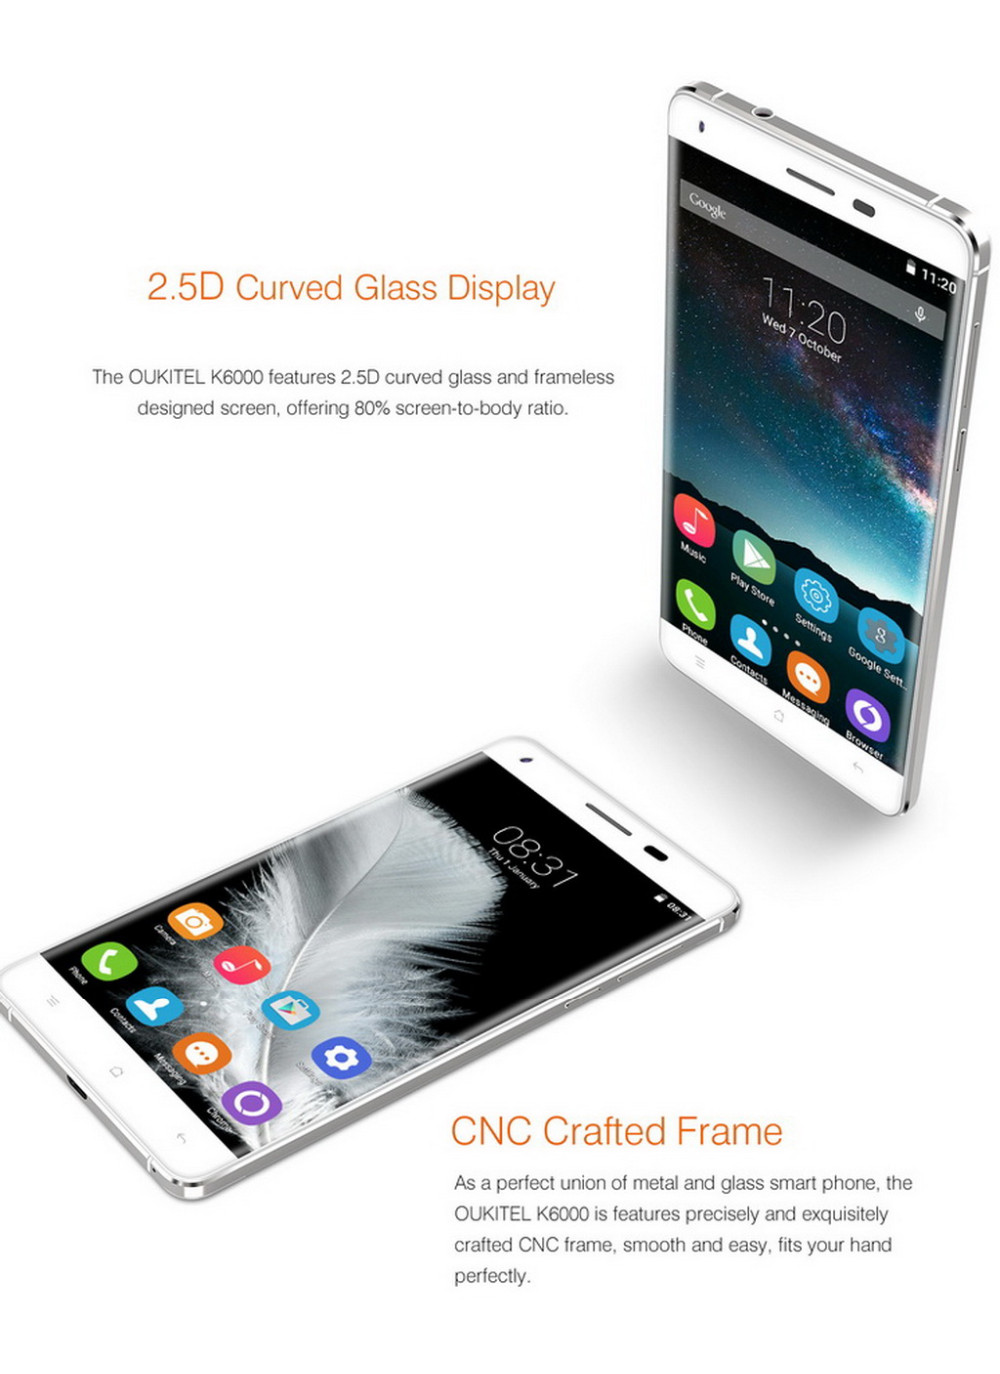 Original OUKITEL K6000 Android 5.1 Smartphone MT6735P 1280 x 720 2G RAM 16G ROM Mobile Phone 5.5 Inch 6000mAh 4G LTE Cell Phone